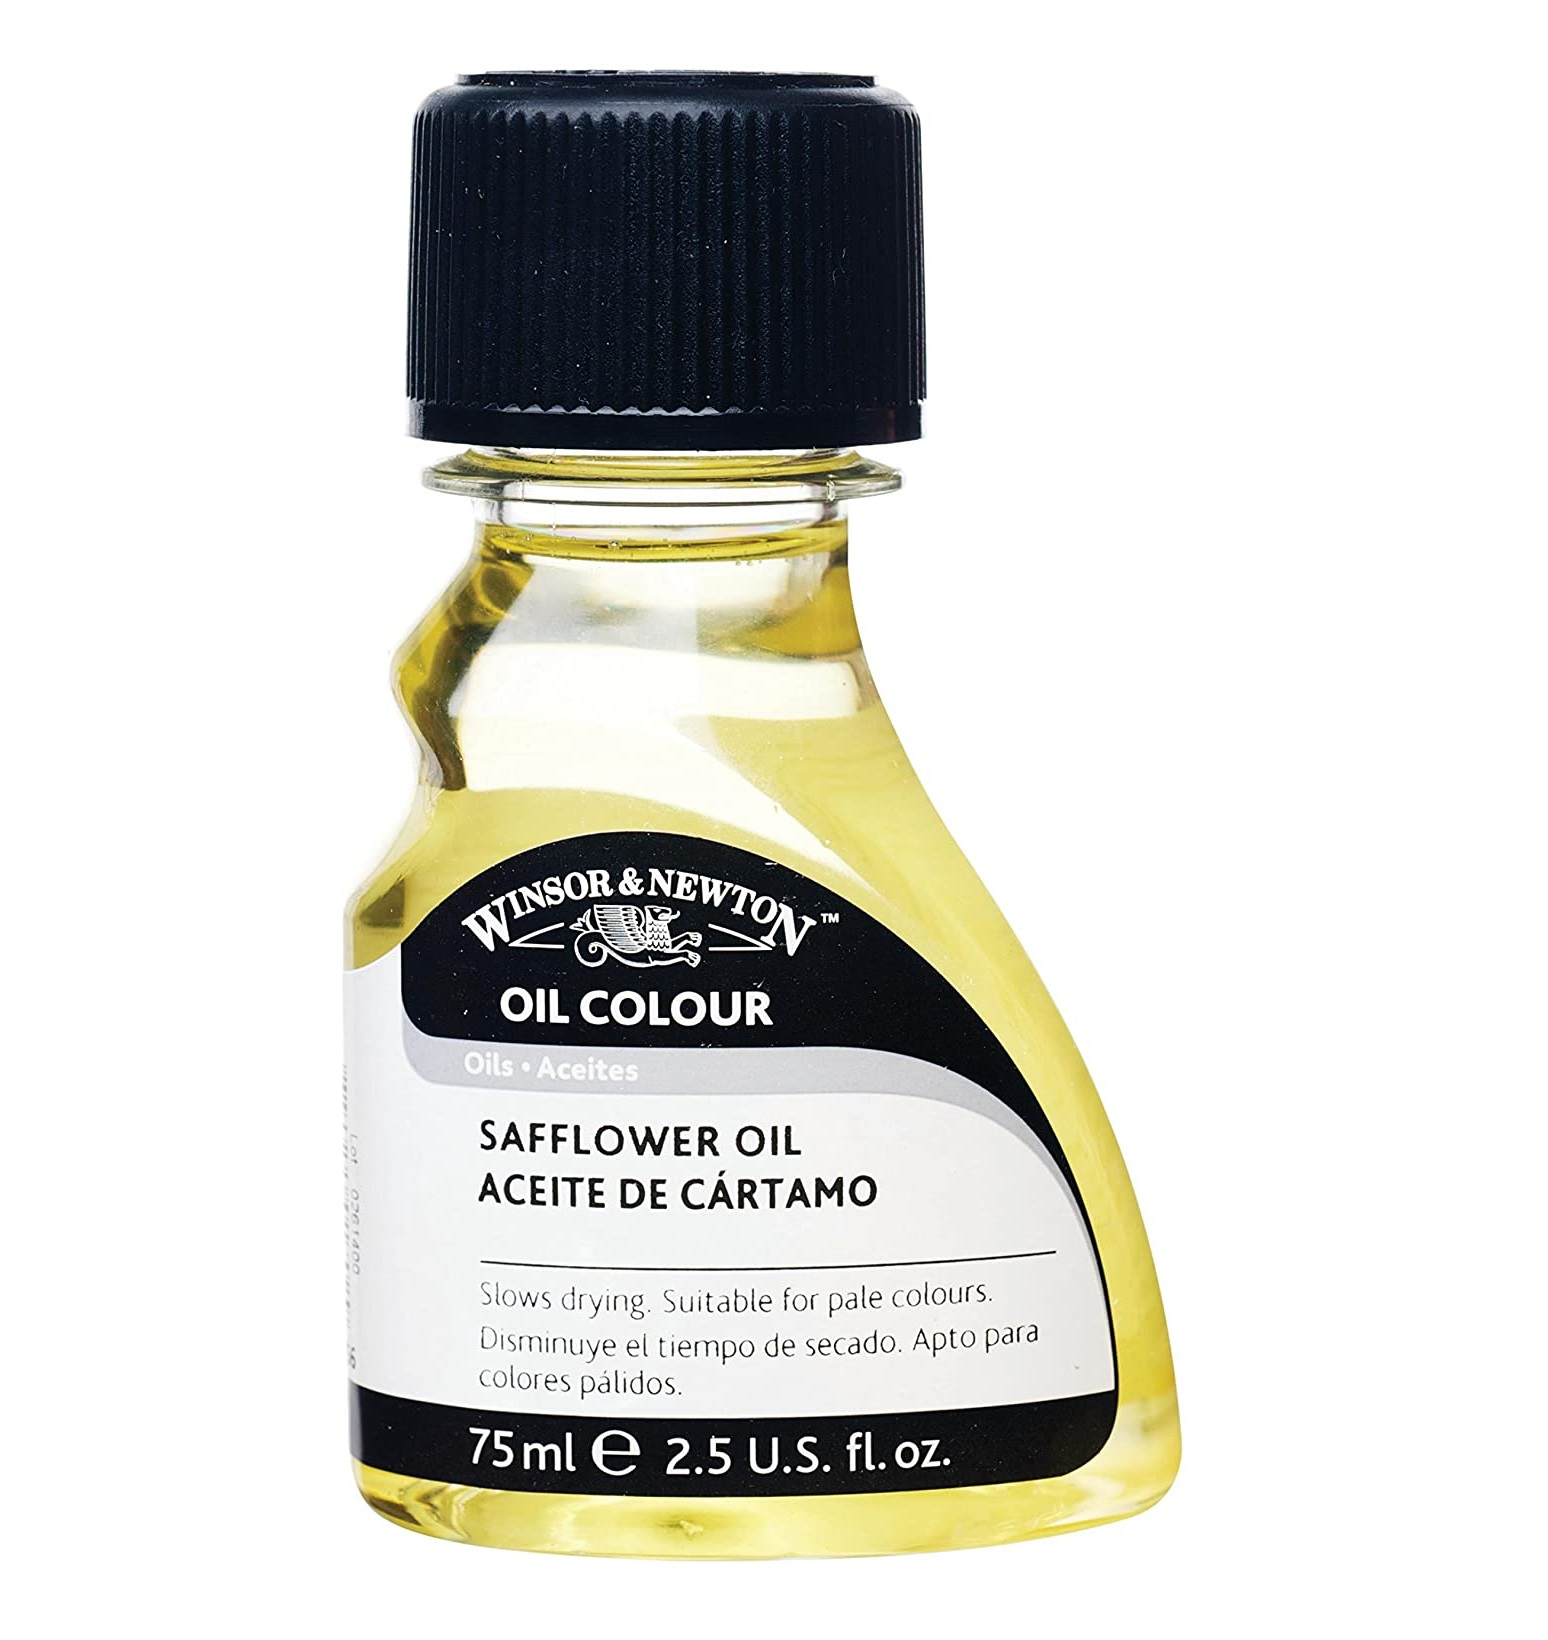 Winsor & Newton Refined Safflower Oil, 75ml